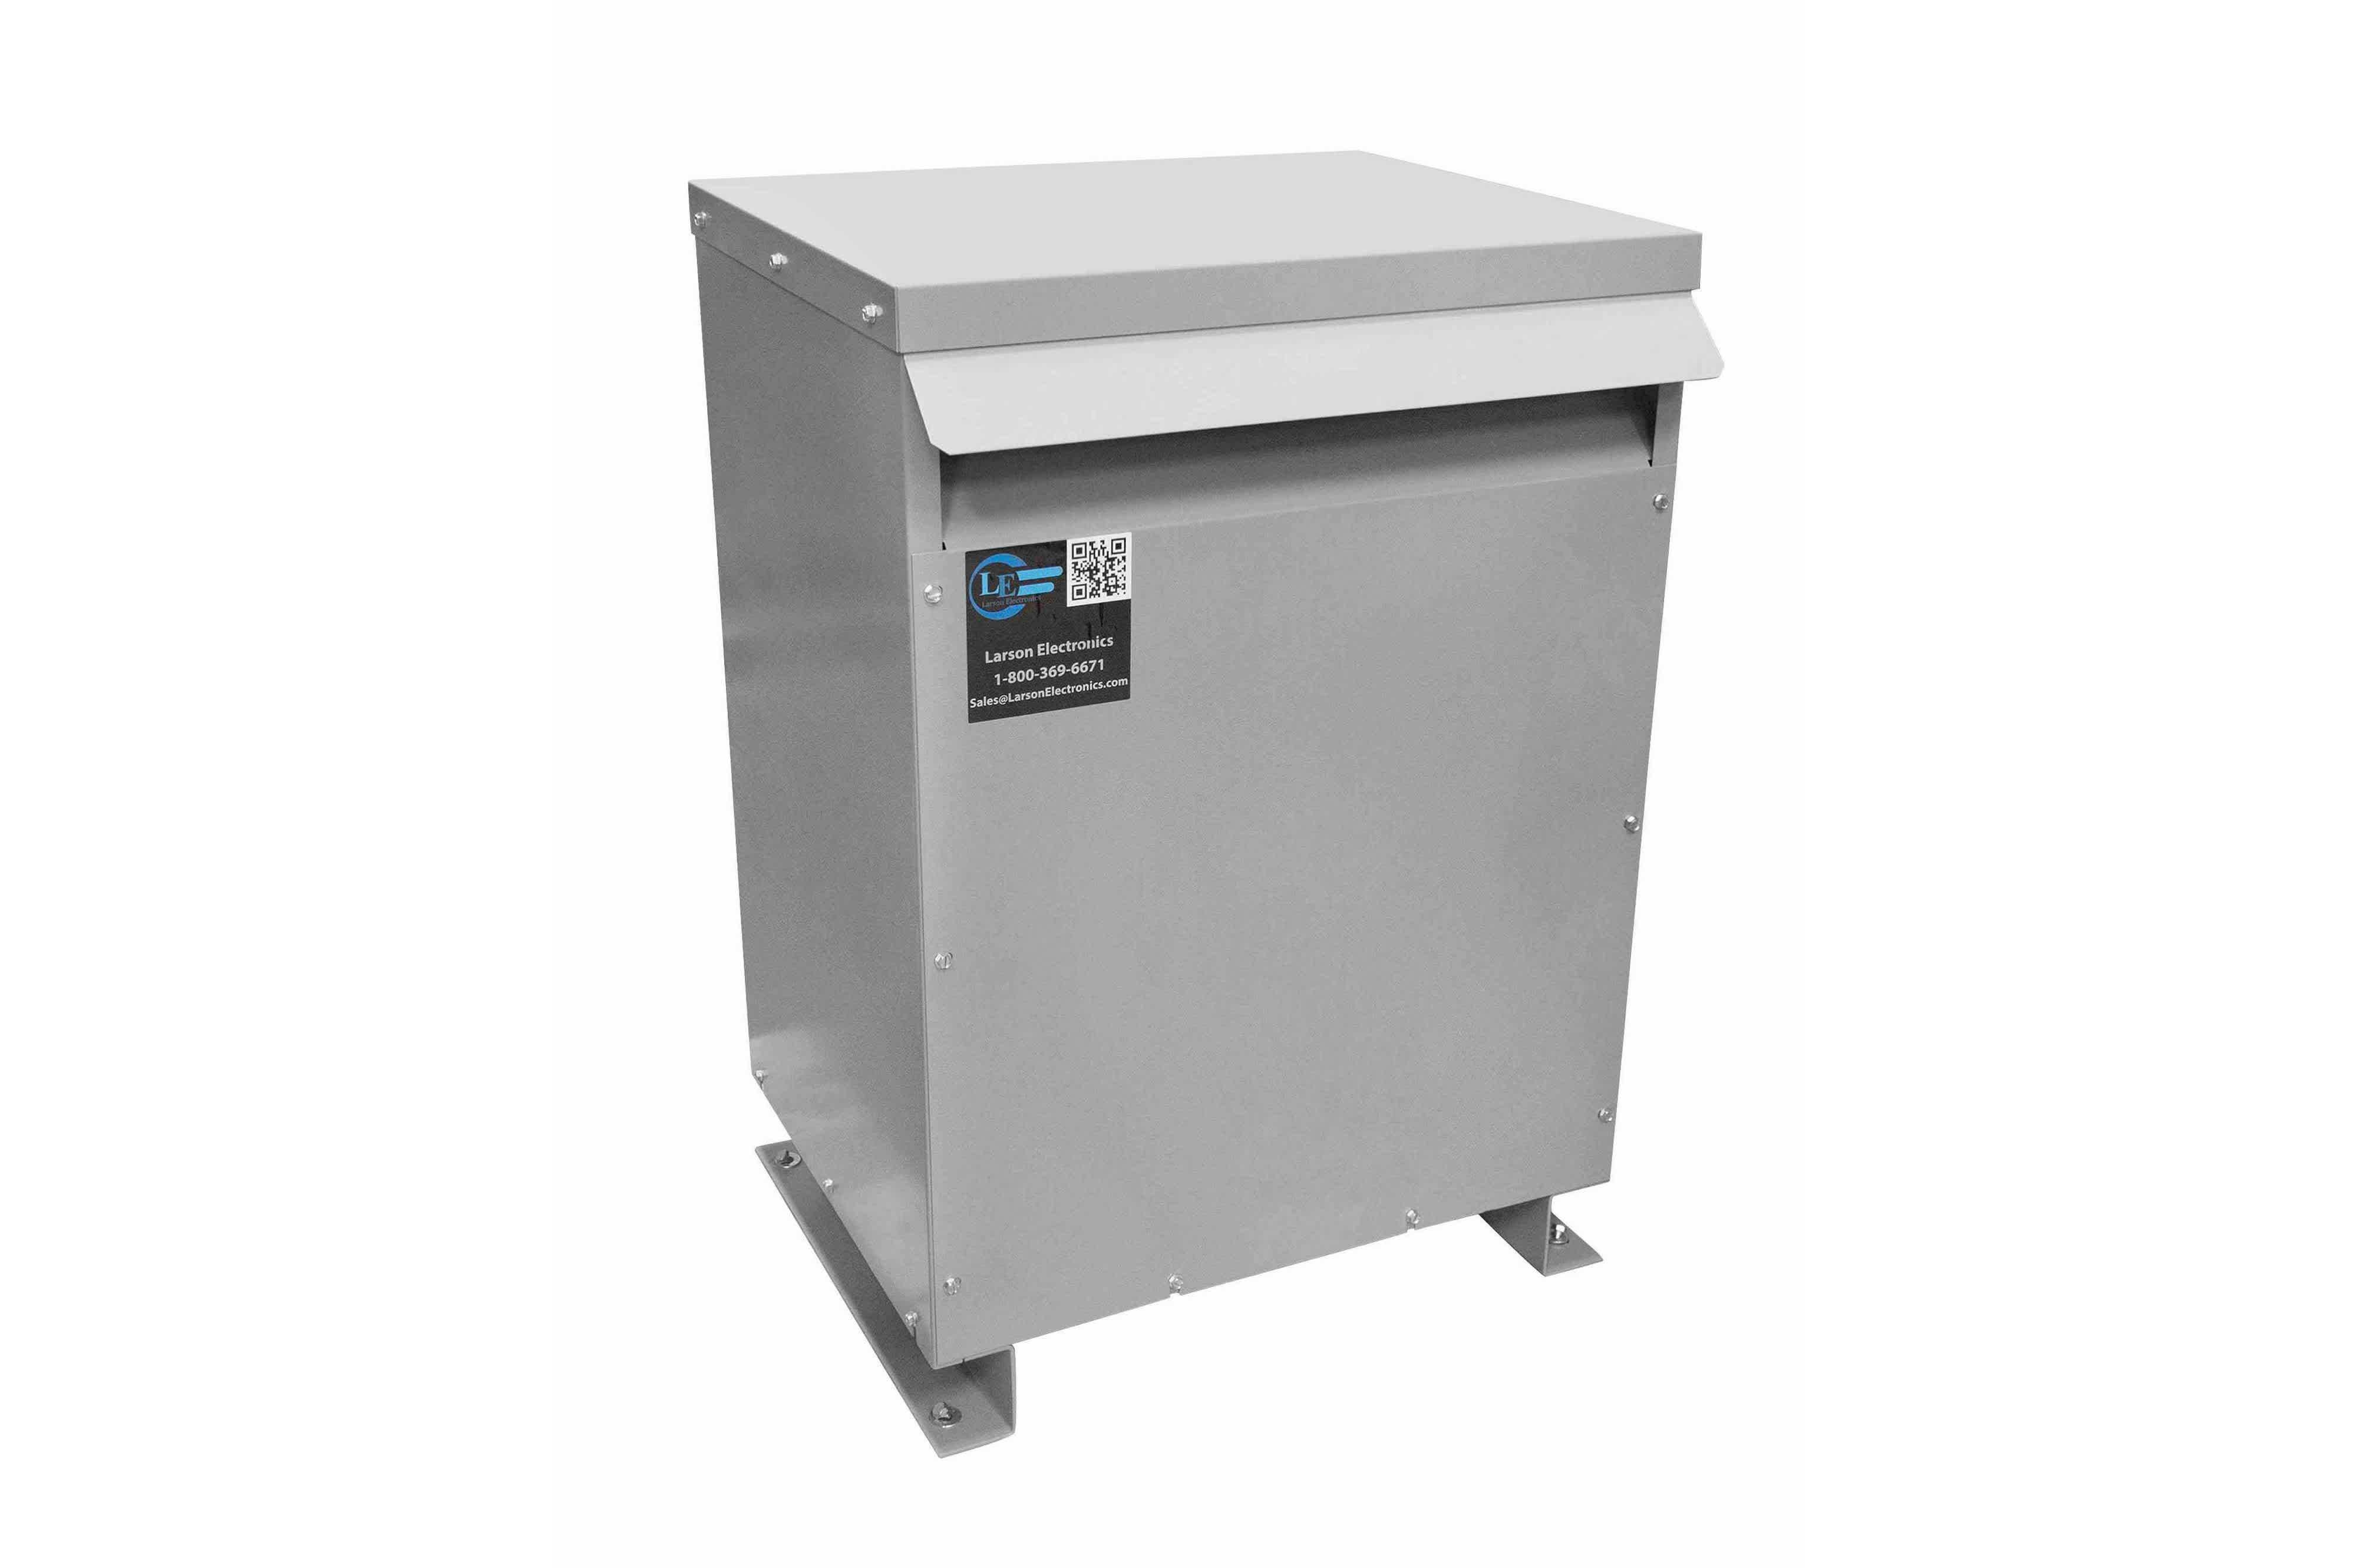 13 kVA 3PH Isolation Transformer, 208V Wye Primary, 208Y/120 Wye-N Secondary, N3R, Ventilated, 60 Hz